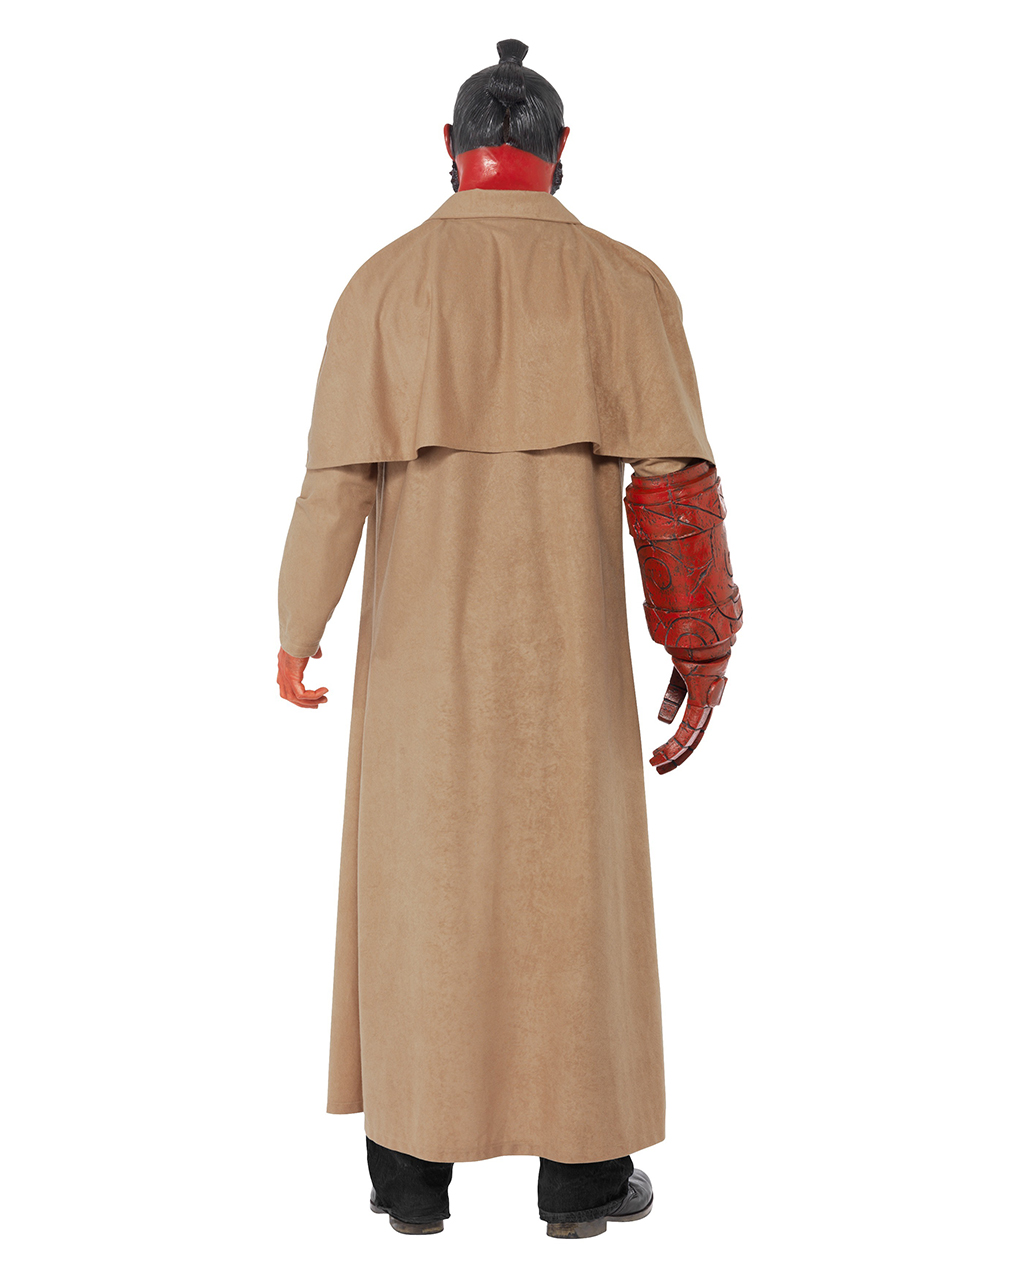 Original hellboy costume hellboy coat mask with - Costume halloween homme original ...